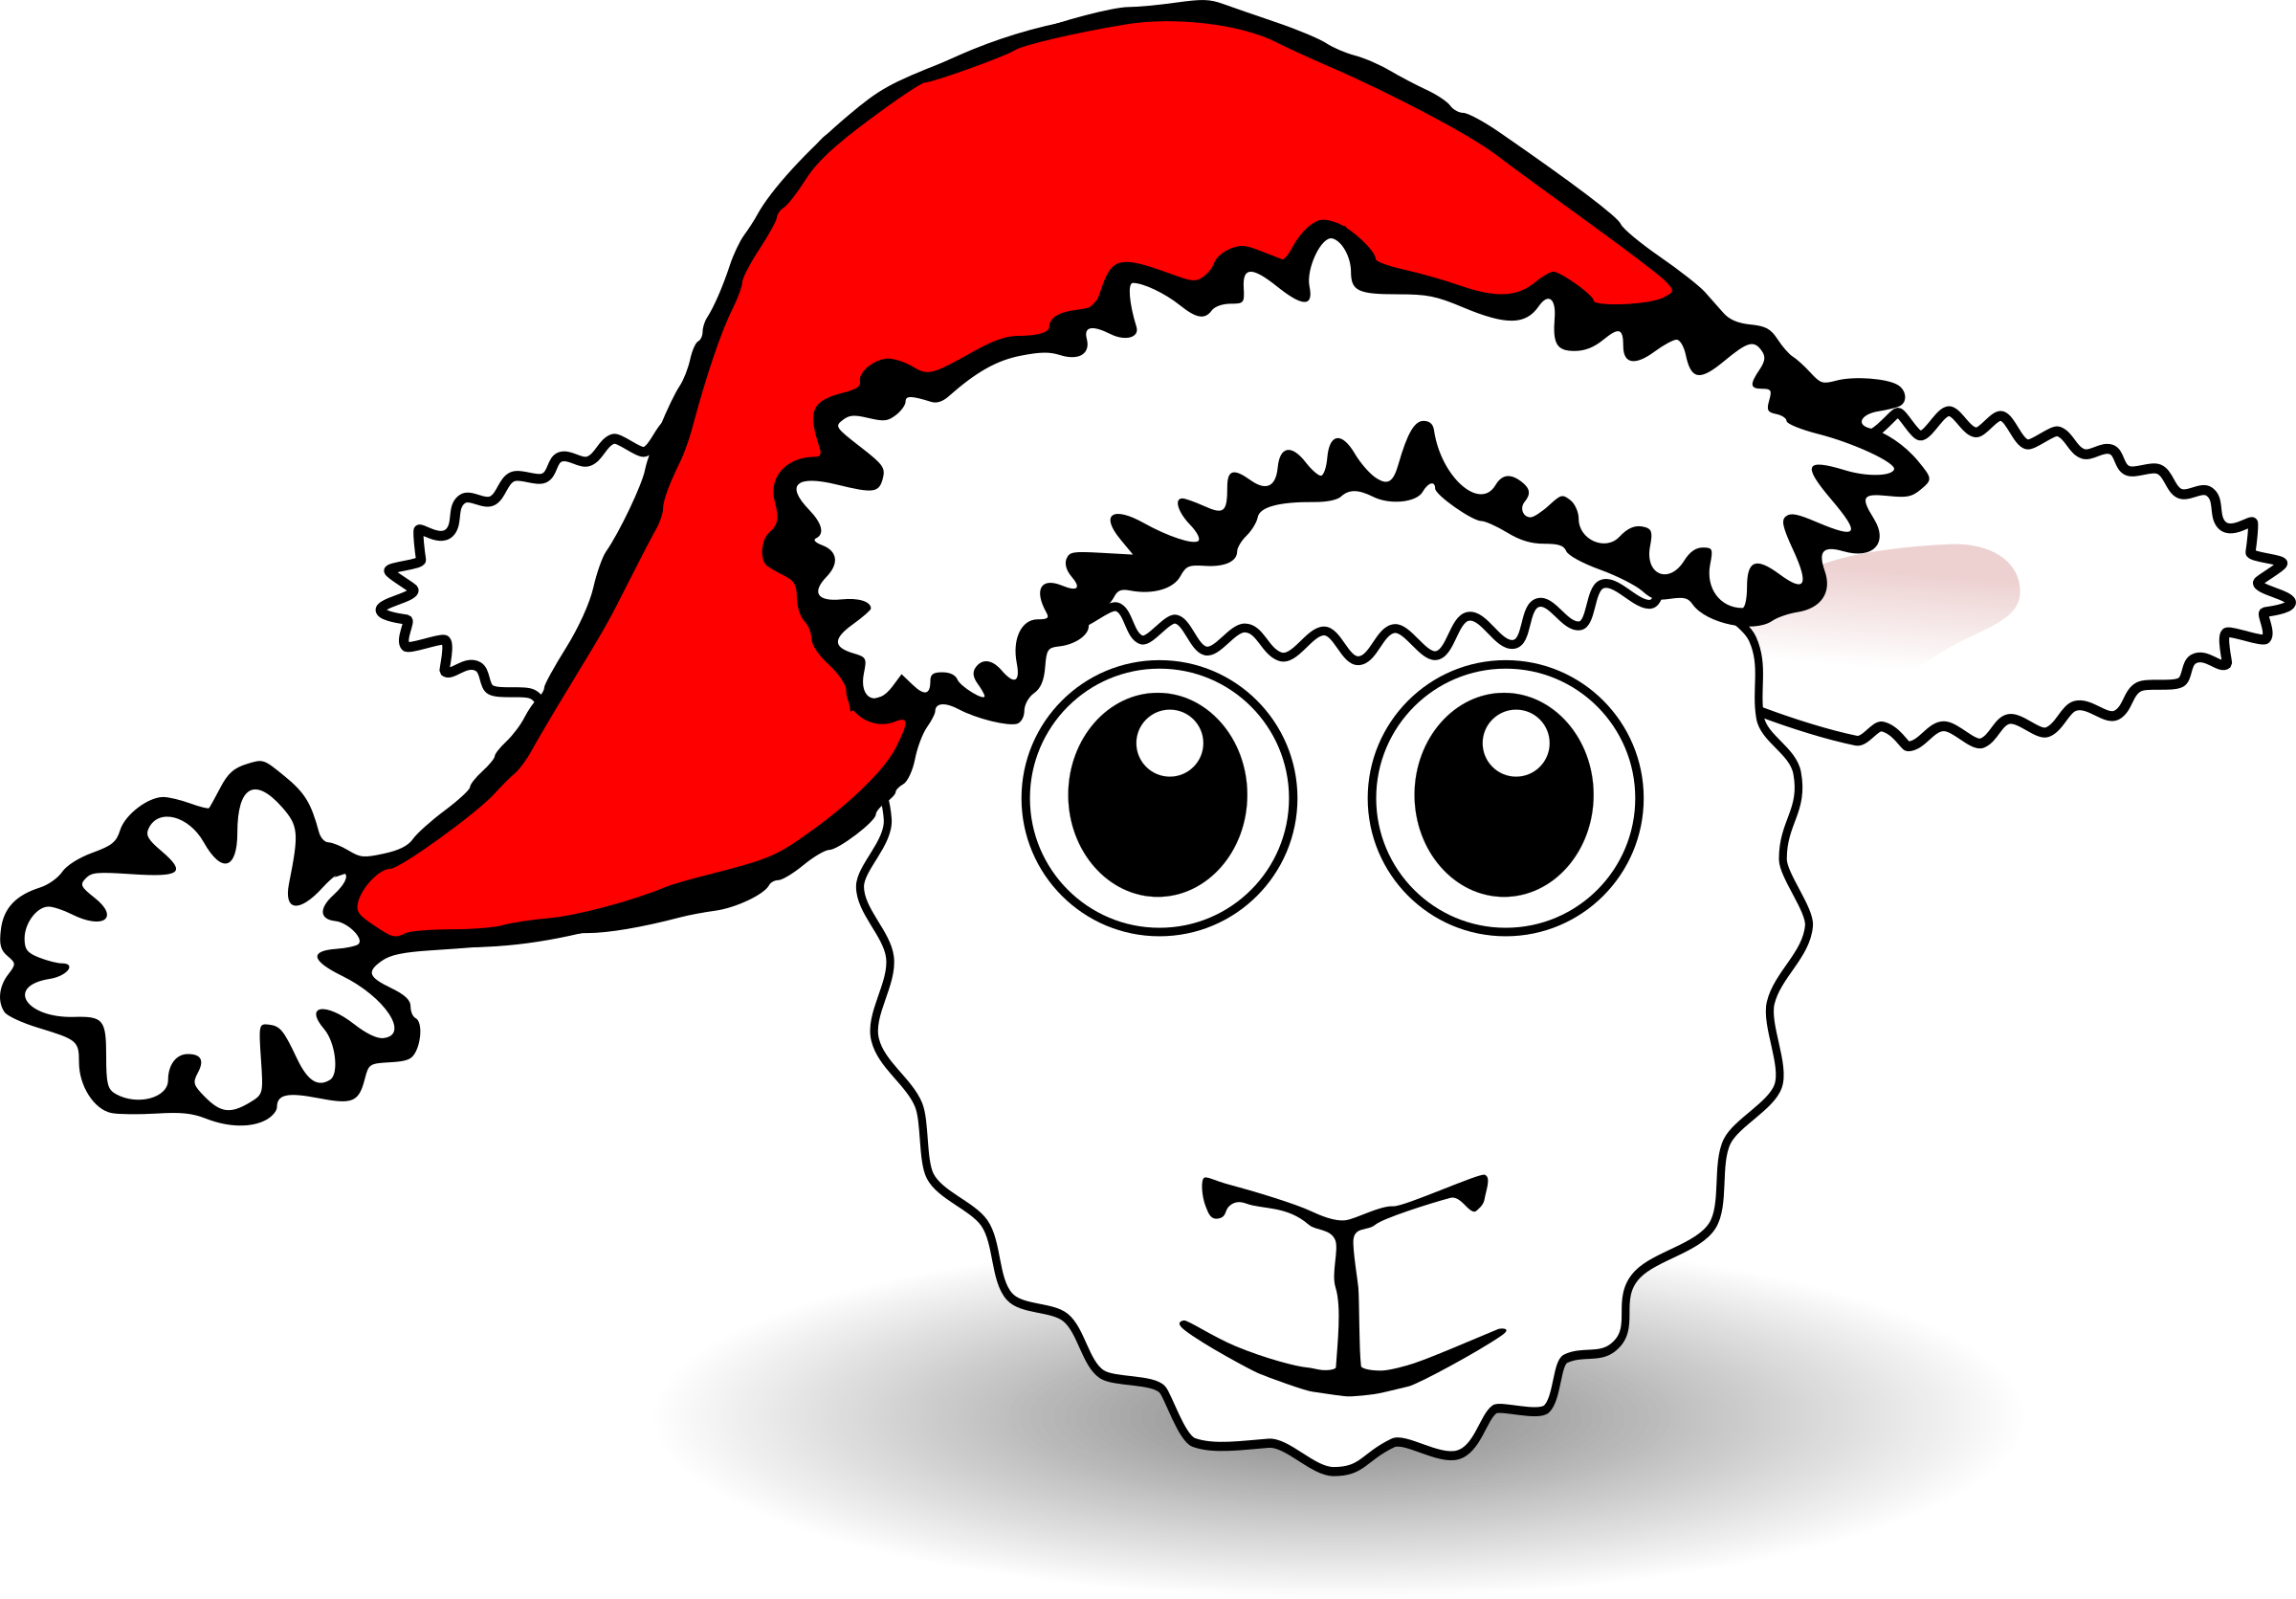 Clipart sheep man. Funny face white cartoon